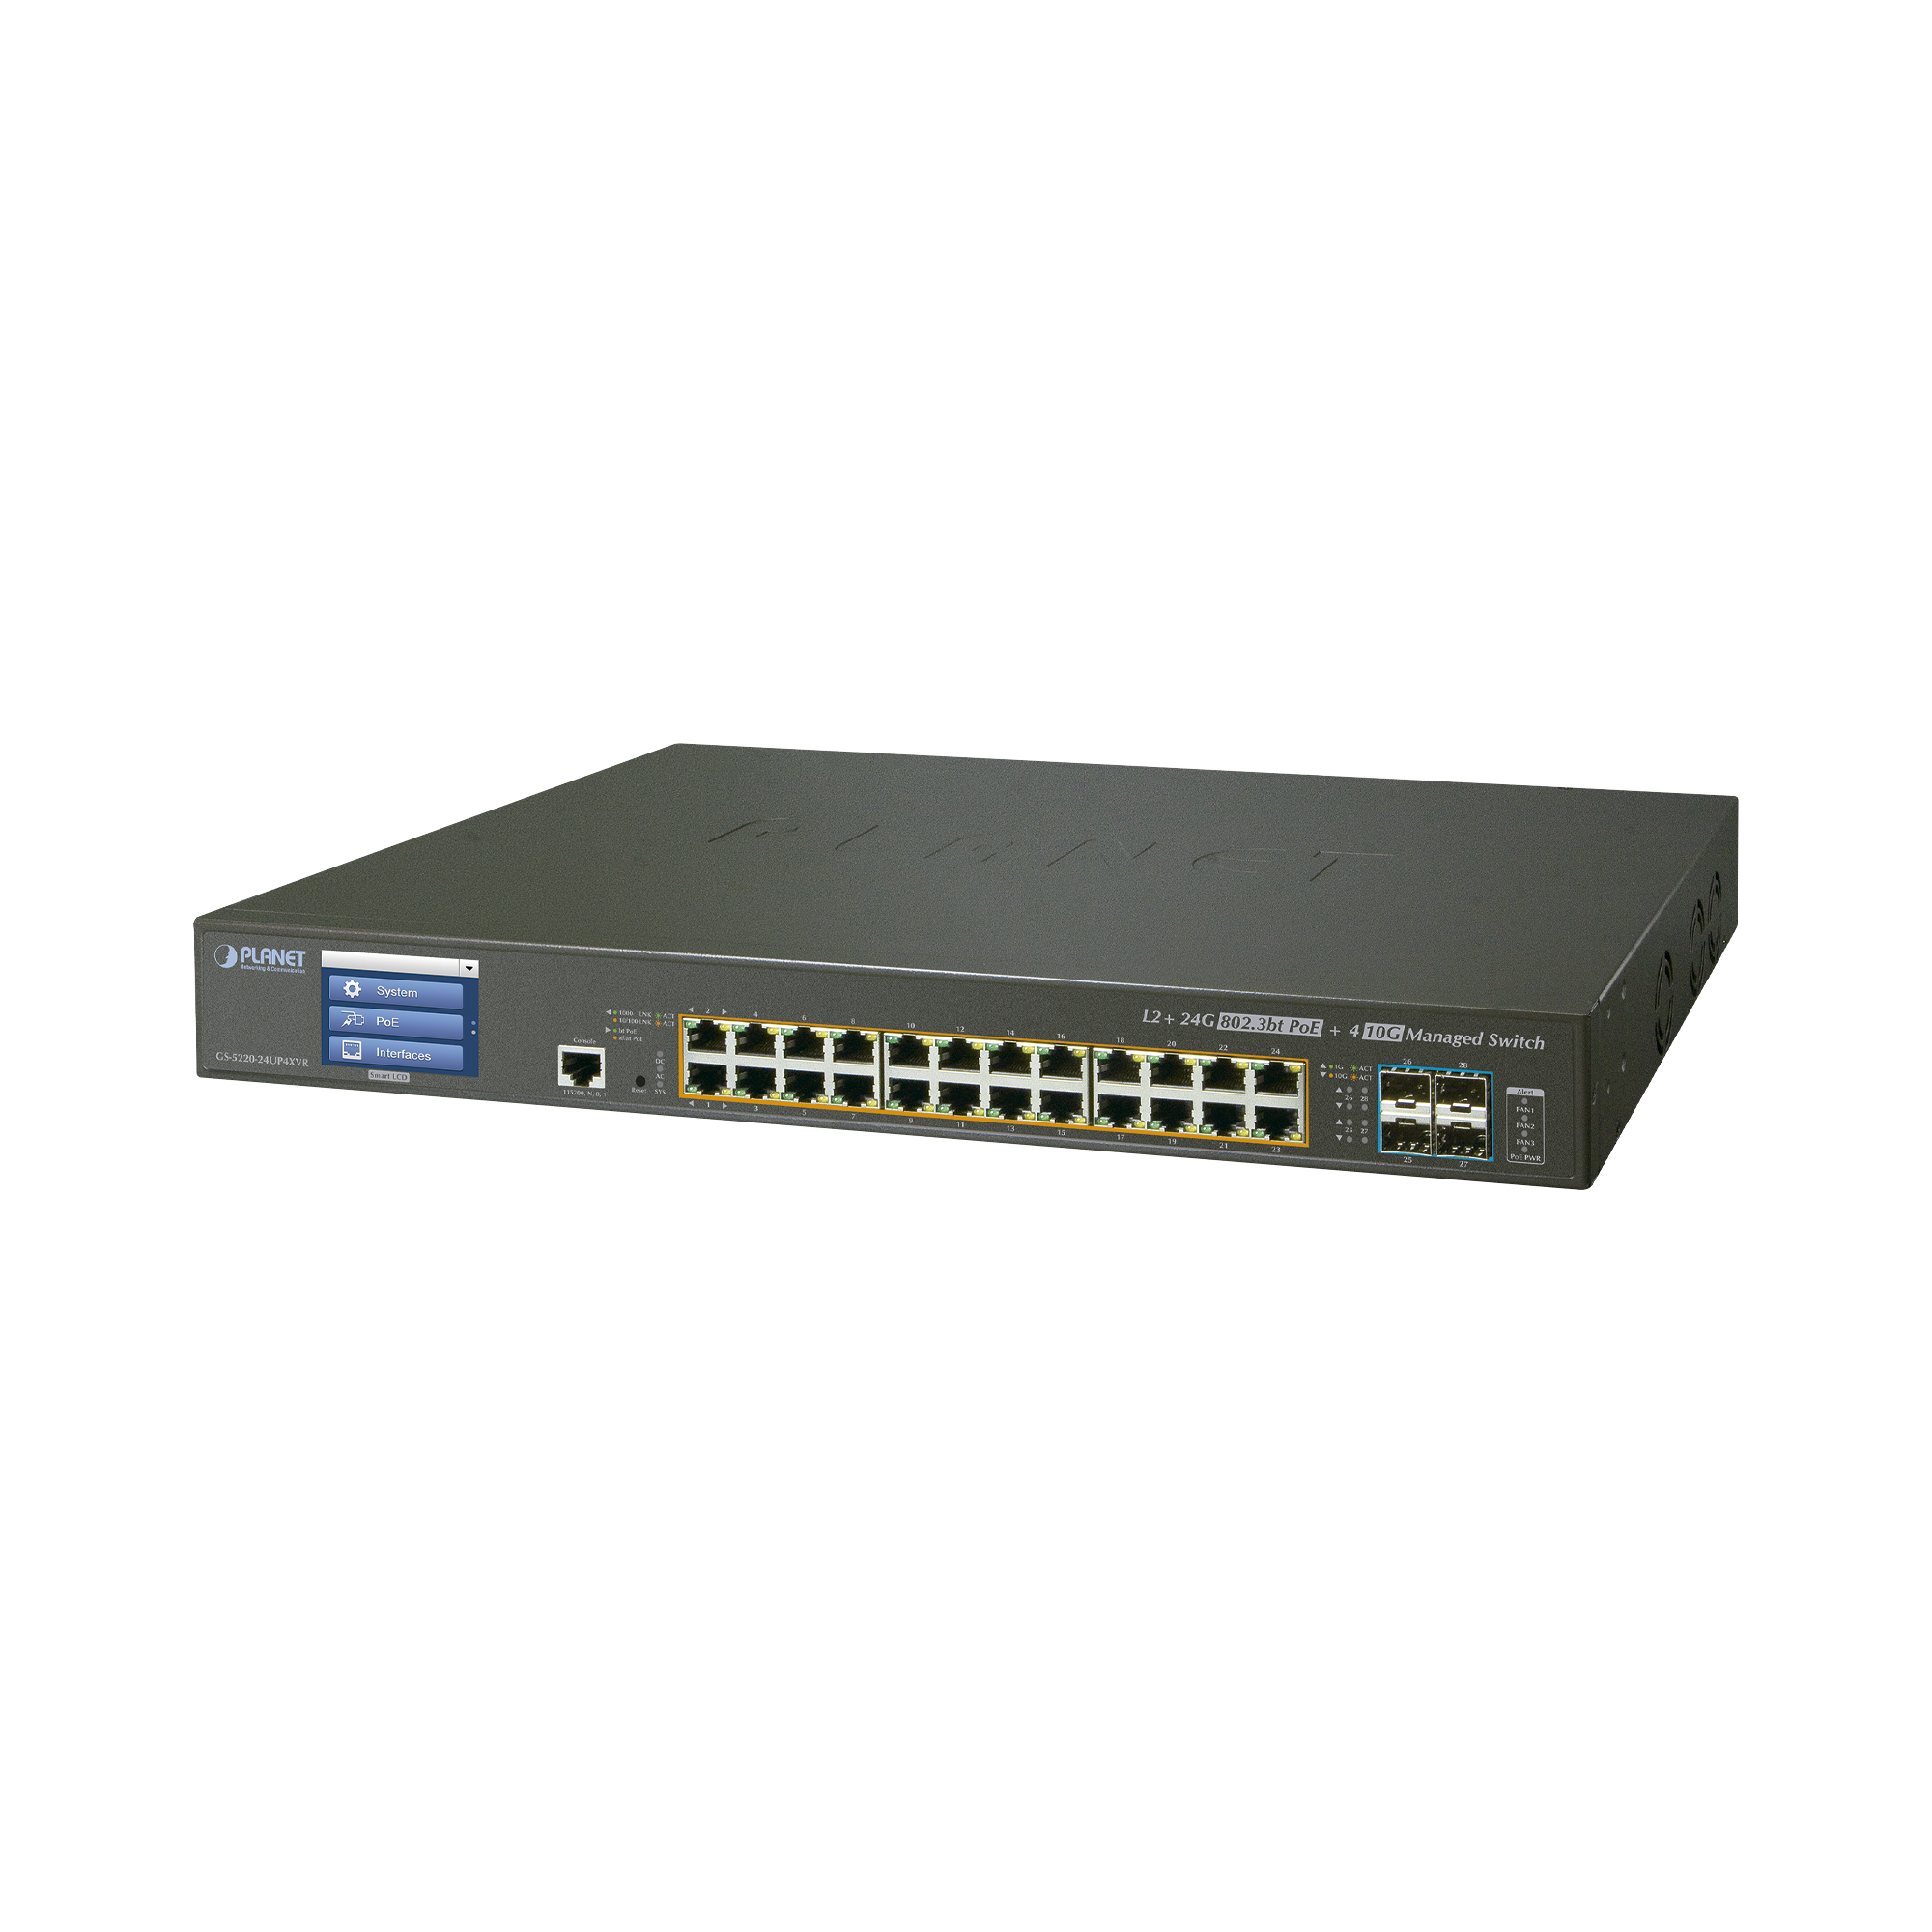 Switch Administrable L2+, 24 puertos Gigabit PoE 802.3bt, 4 puertos 10G SFP+,Pantalla táctil, Fuente Redundante, (400W)